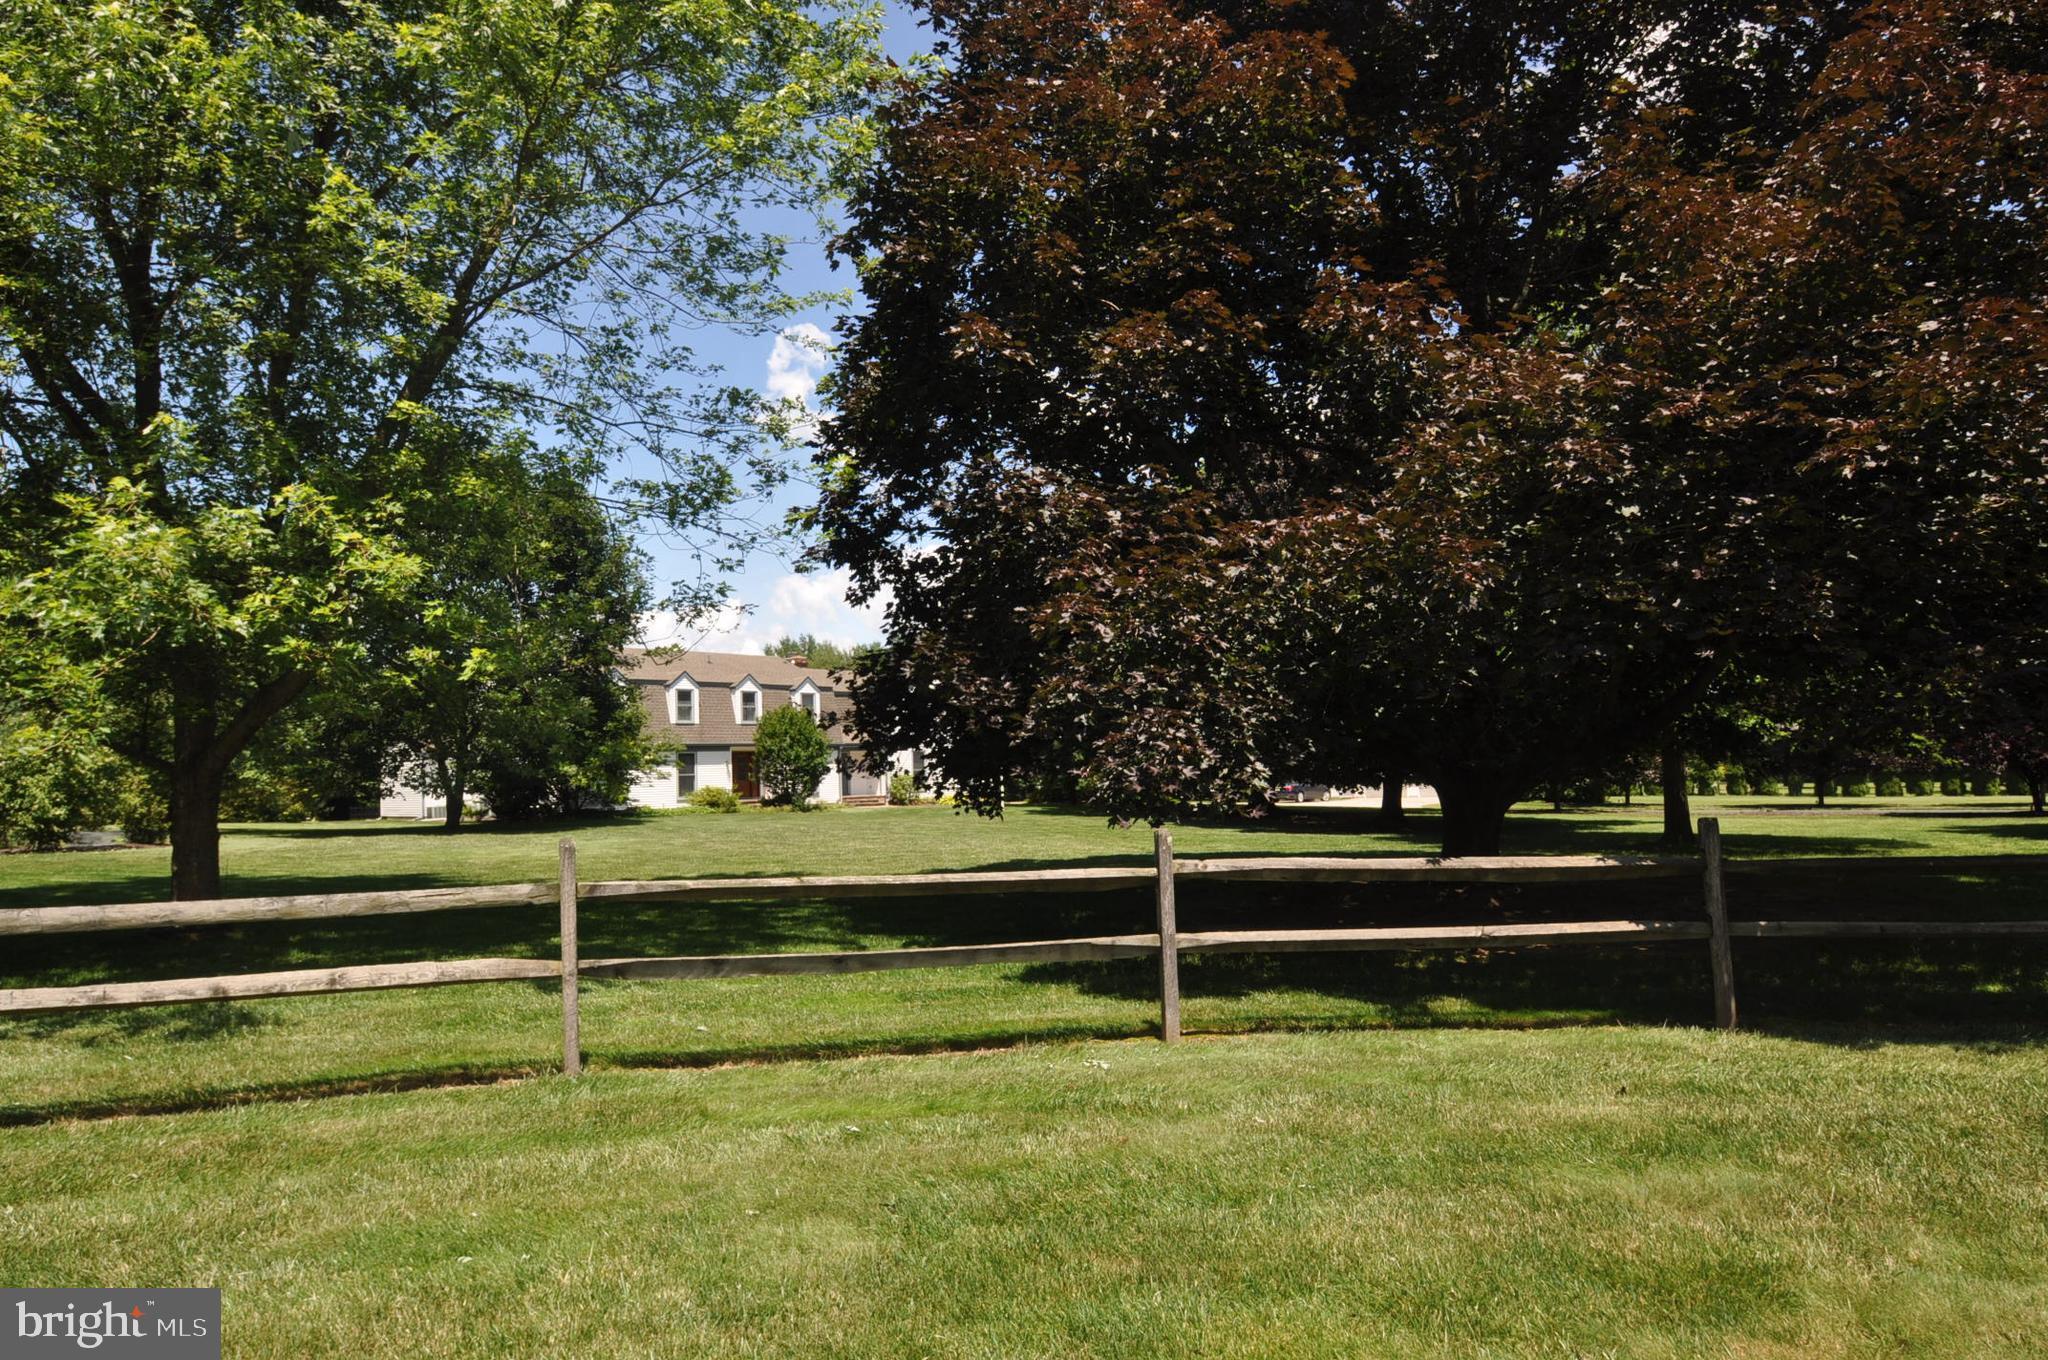 5 TULIP TREE DRIVE, BURLINGTON, NJ 08016